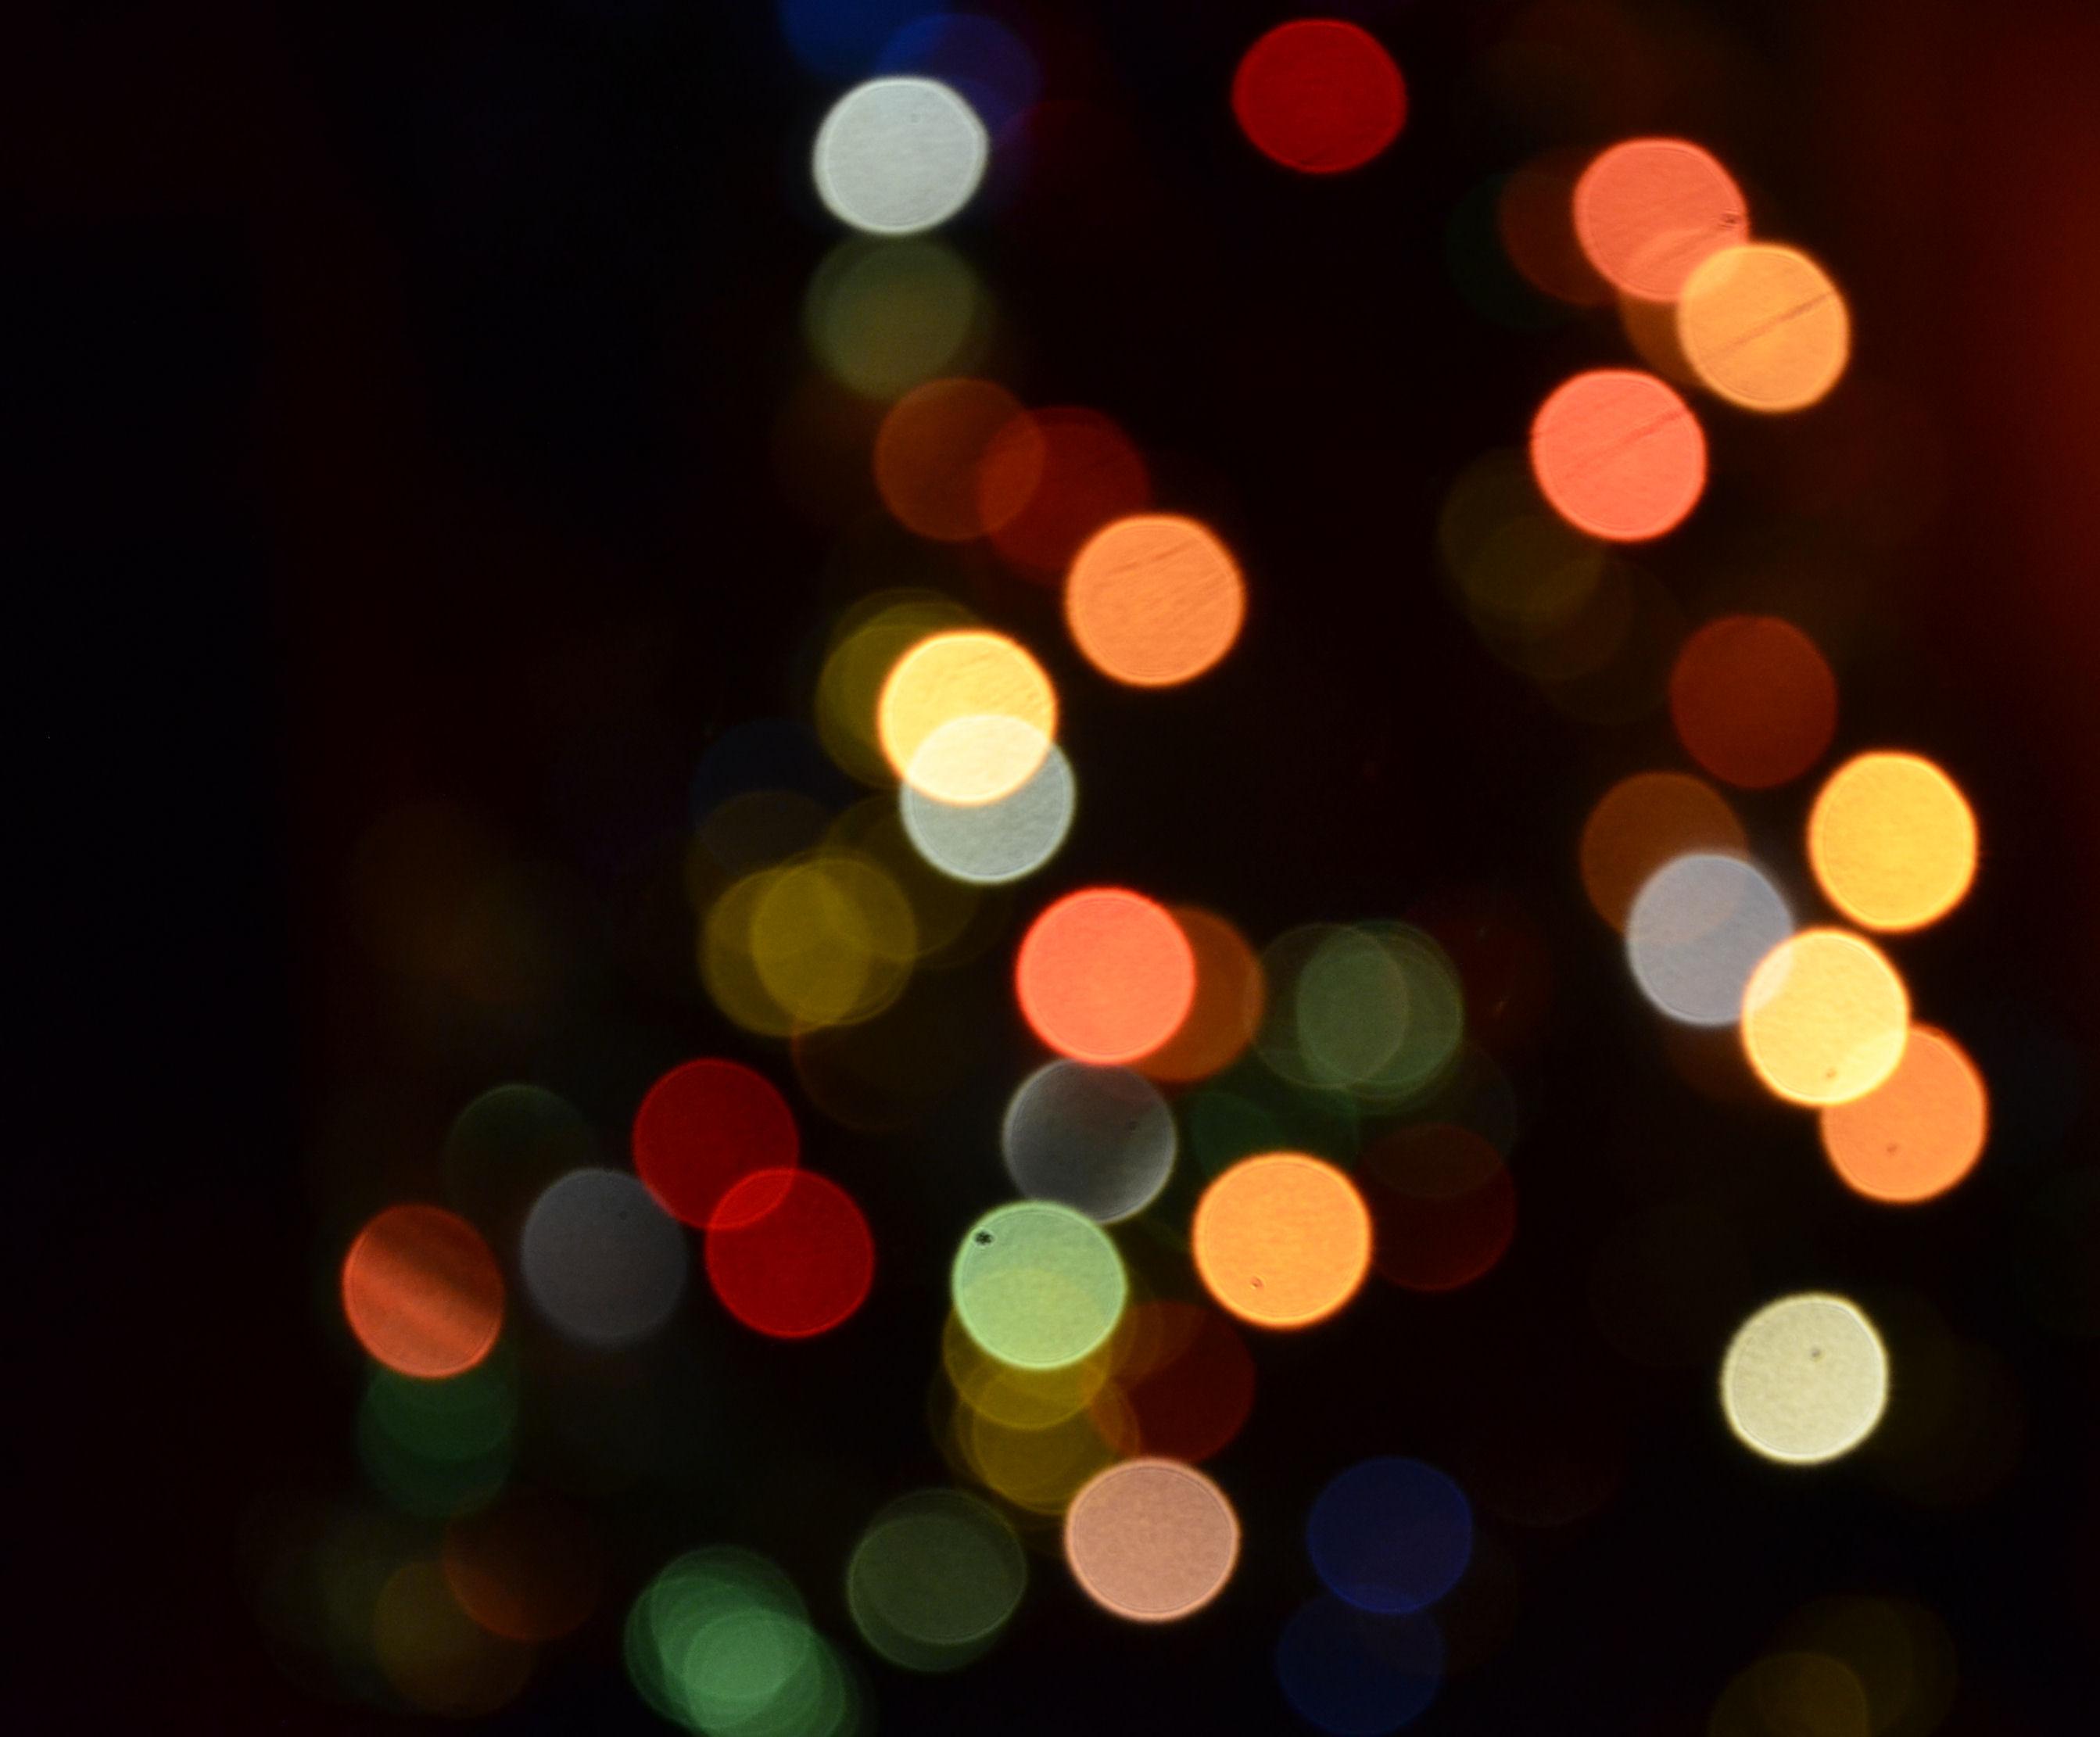 Textures Lights on PSResources - DeviantArt